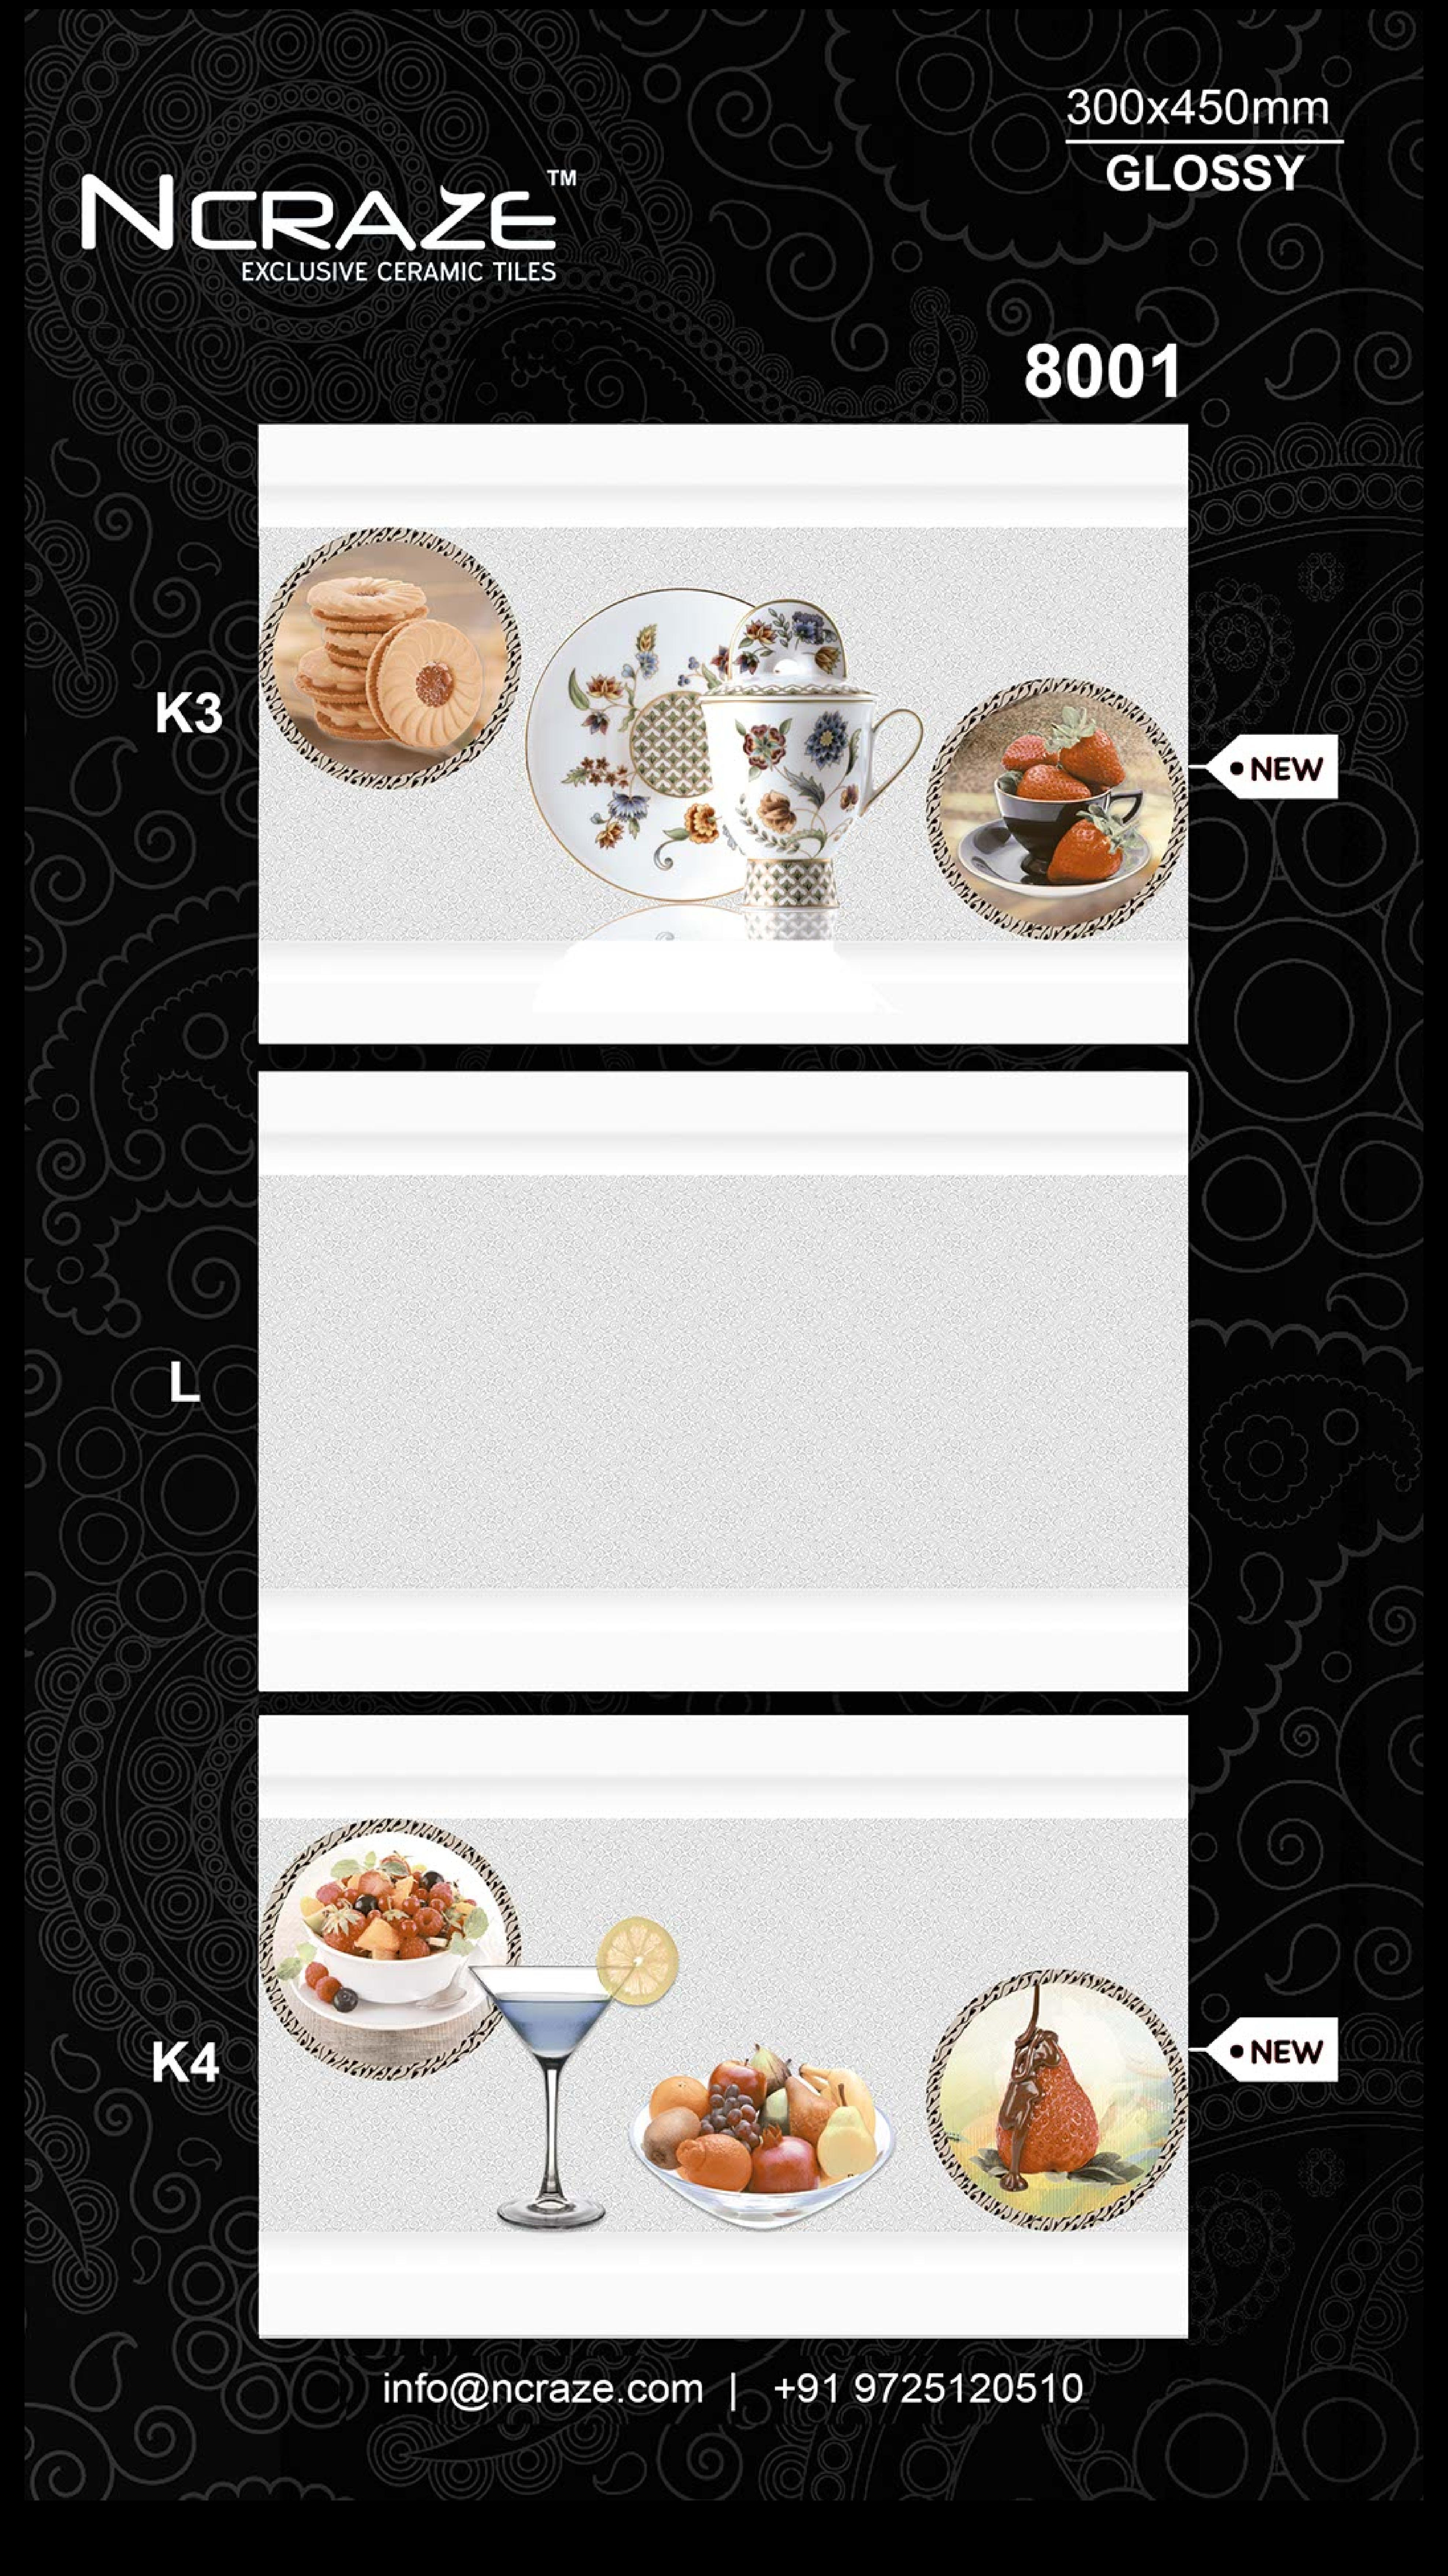 350x450 Digital Kitchen Wall Tiles